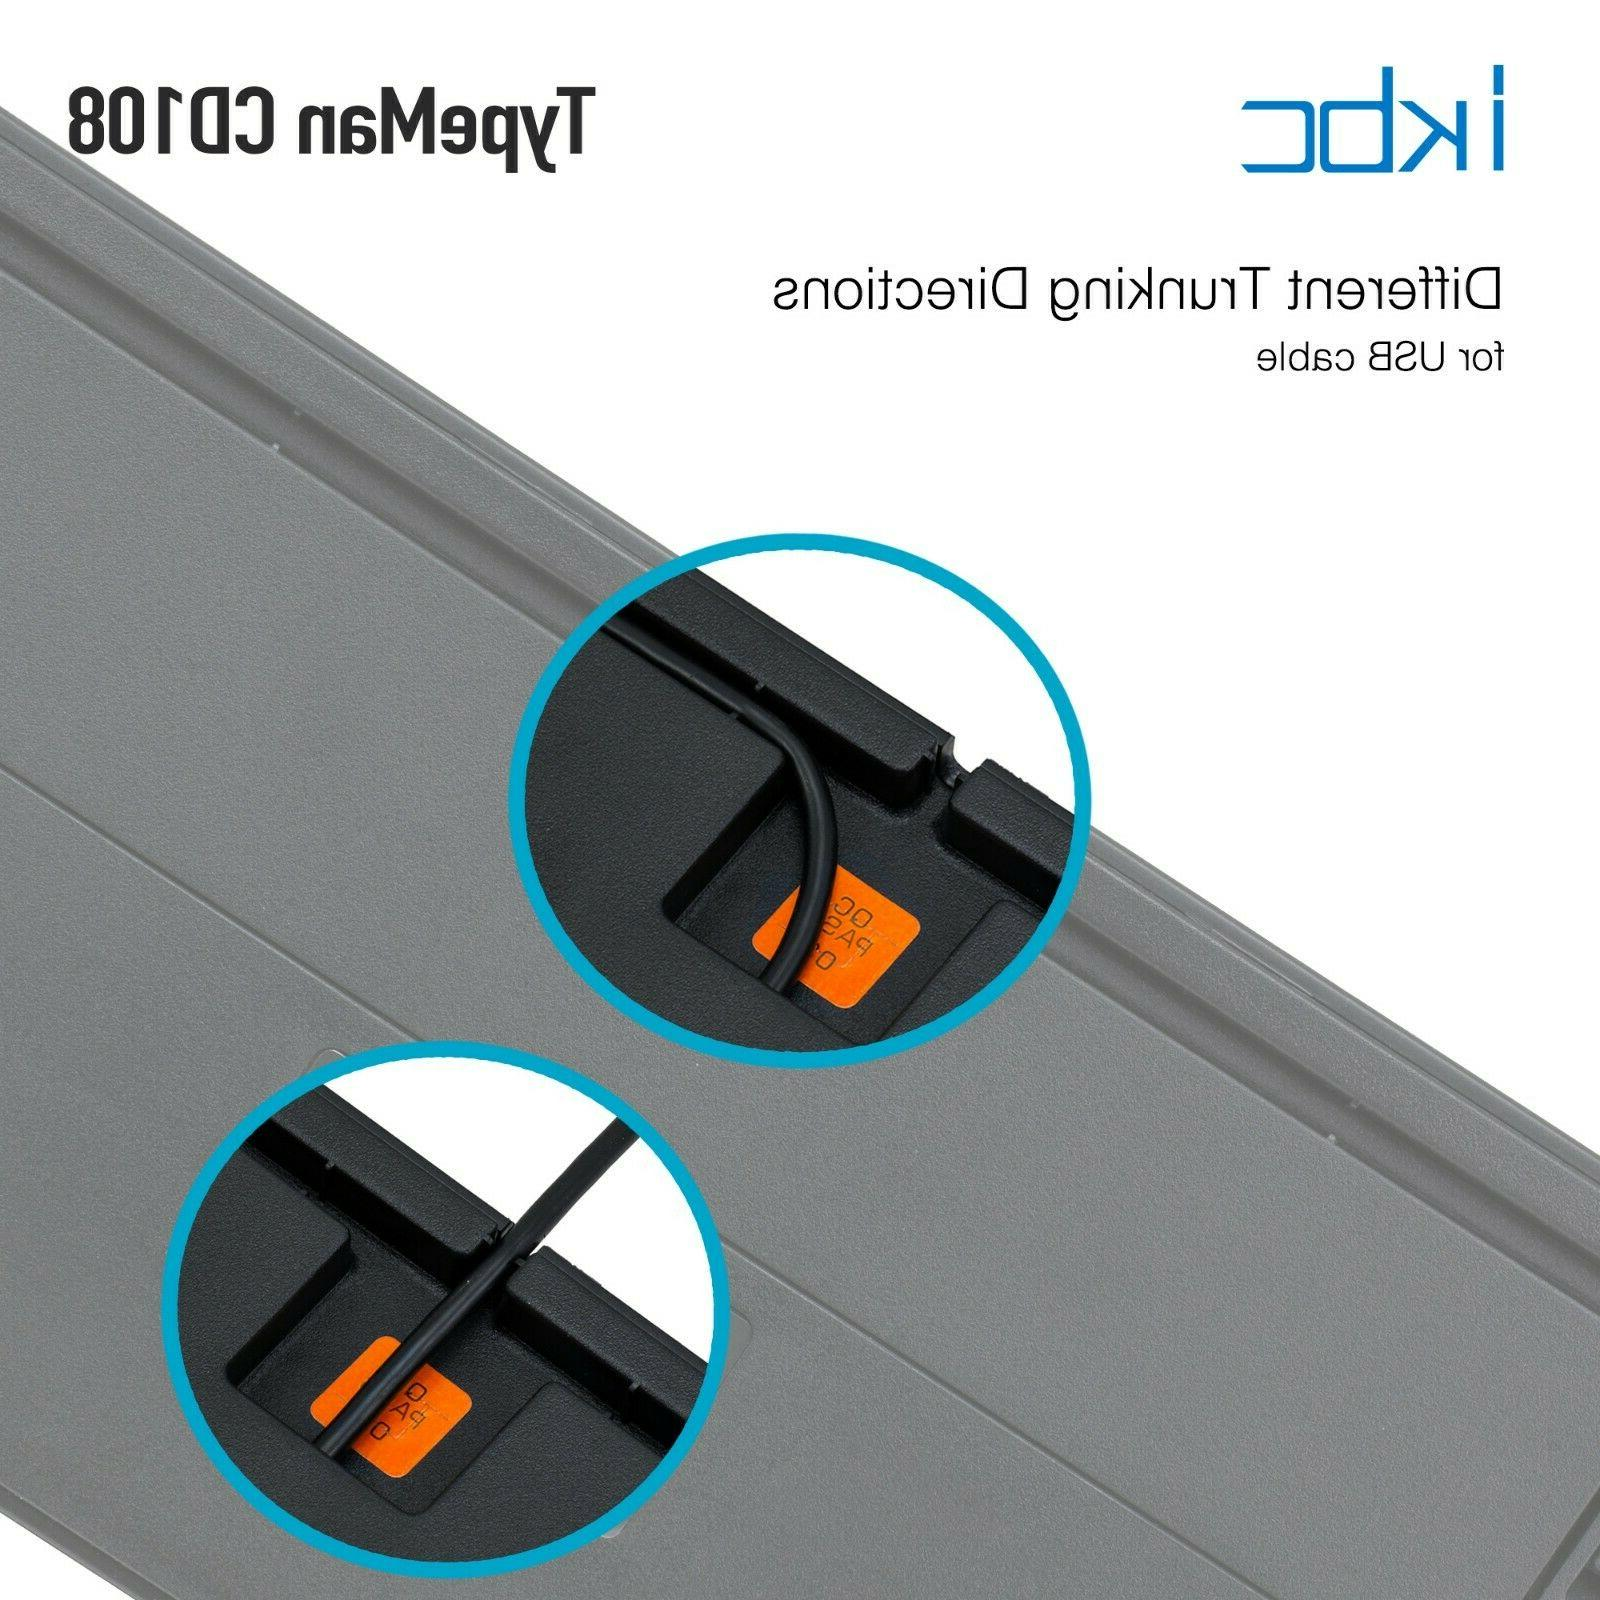 iKBC CD108 v2 Mechanical Ergonomic Keyboard MX Switch